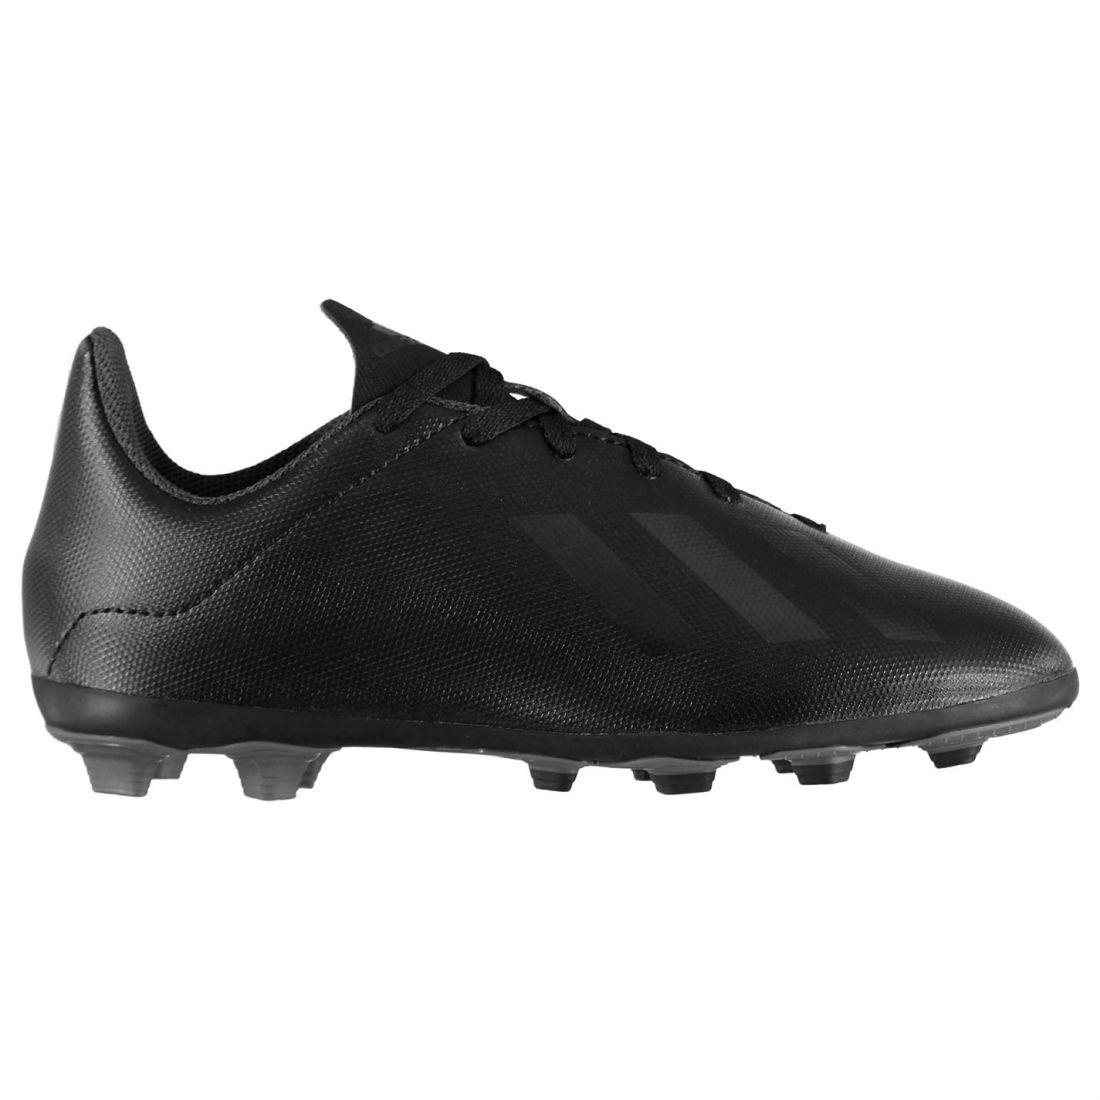 bda6958b7 adidas Kids Boys X 18.4 Childs FG Football Boots Firm Ground Lace Up ...